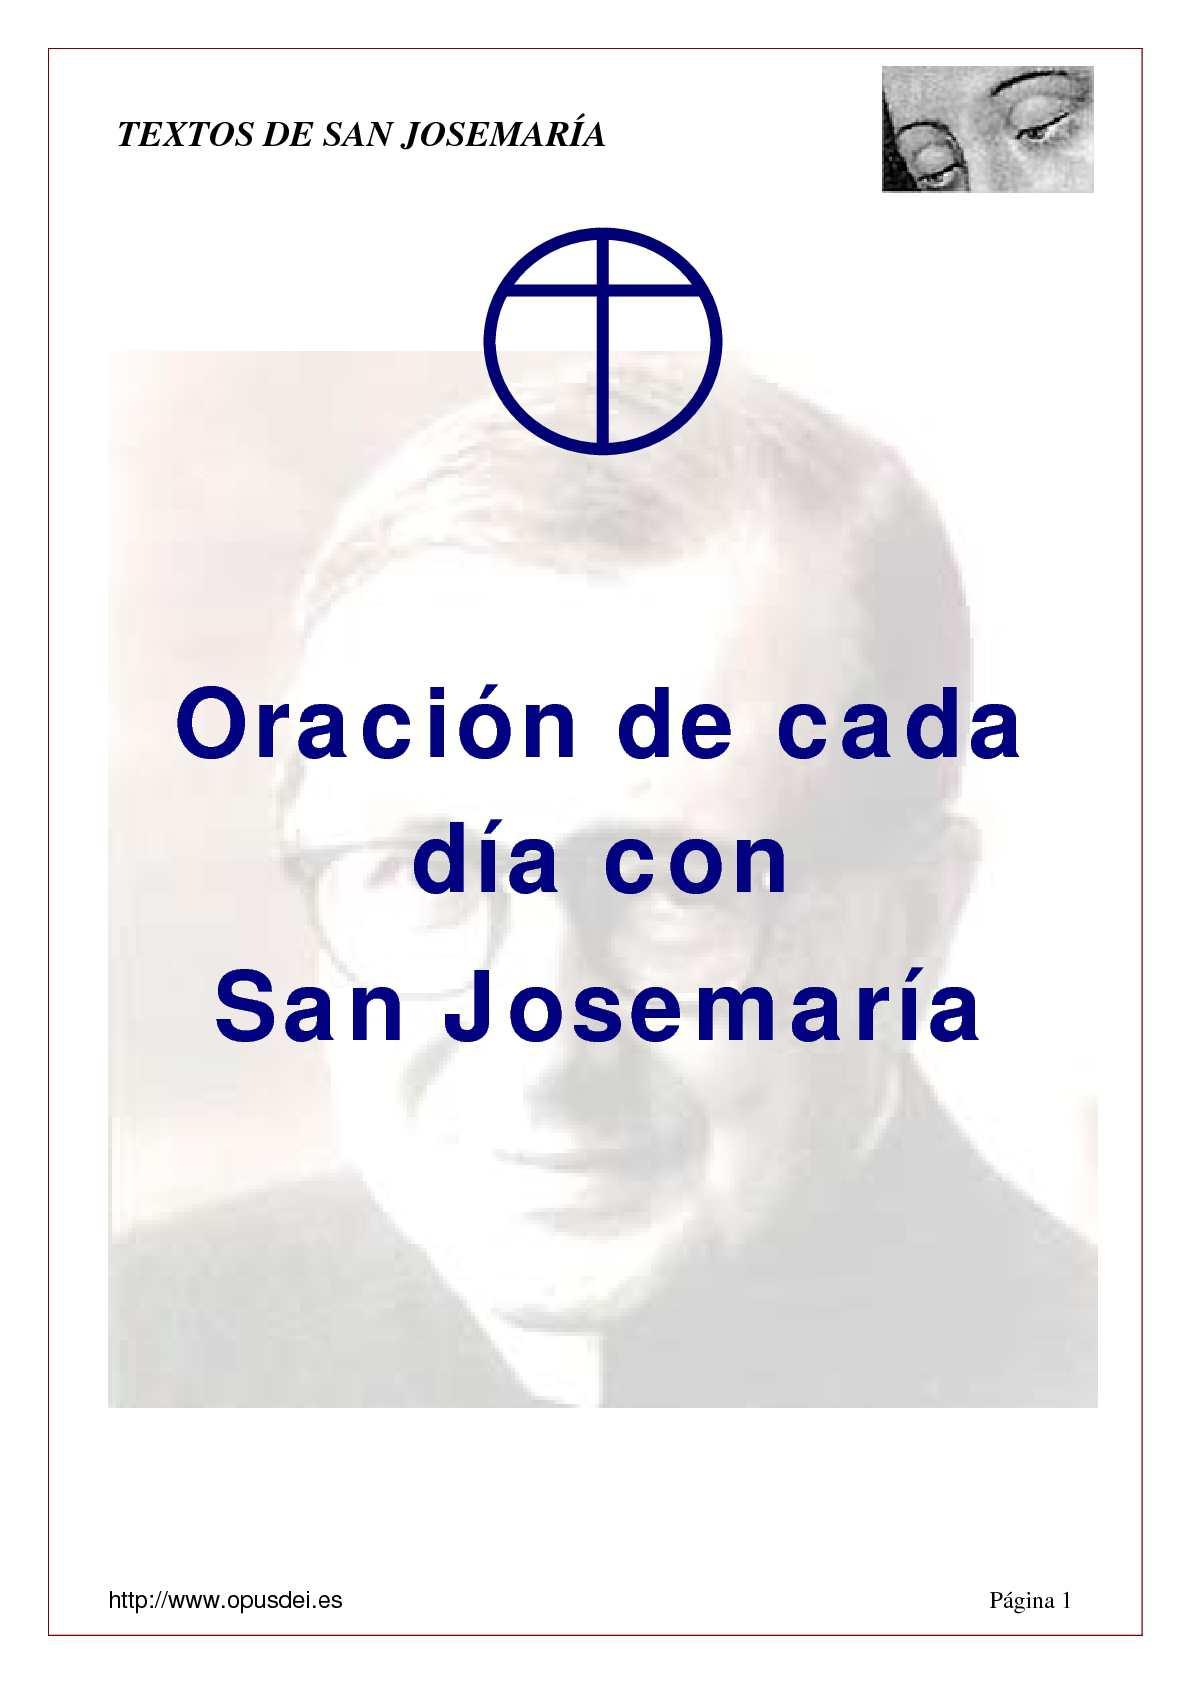 ddbee6f6c9348 Calaméo - Oración de San Josemaría para cada día